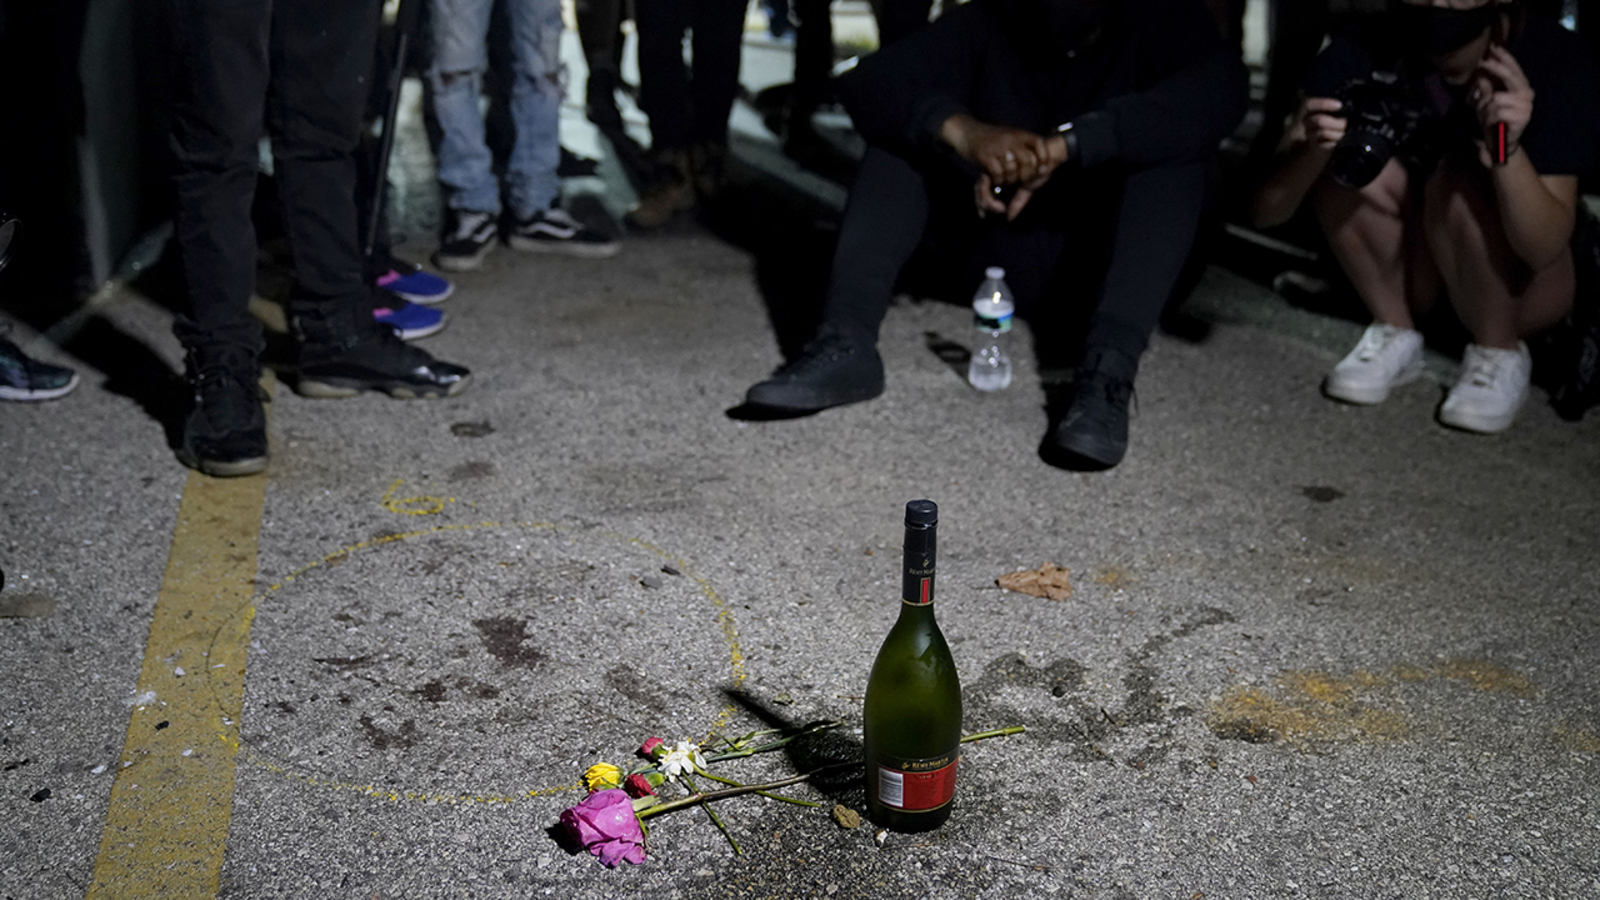 Anthony Huber Joseph Rosenbaum Tried To Disarm Kyle Rittenhouse Before Fatal Shooting During Jacob Blake Protest In Kenosha Reports 6abc Philadelphia